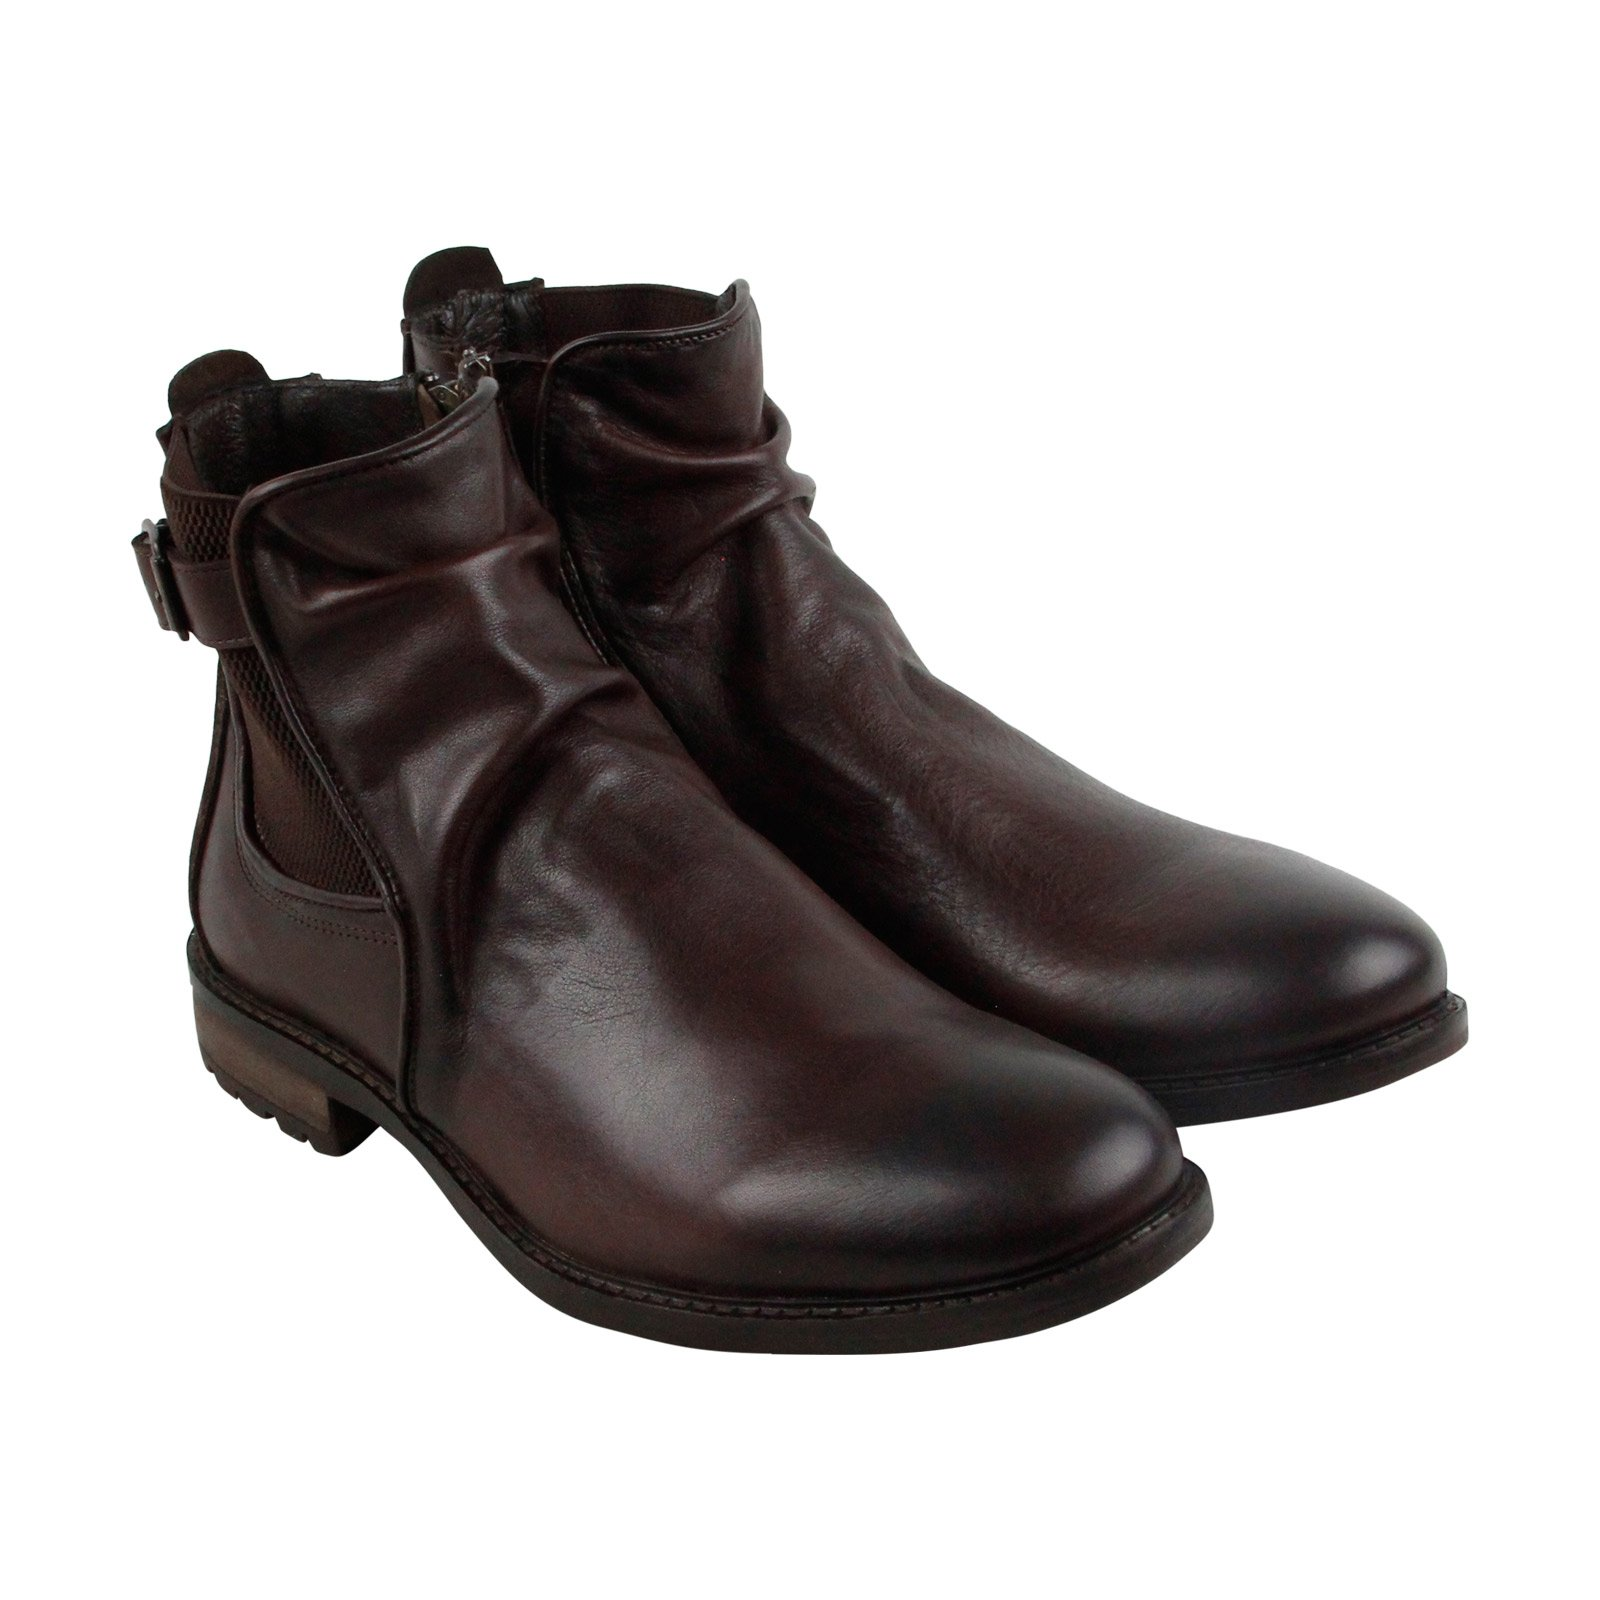 Steve Madden Men's Loren Chelsea Boot, Dark Brown, 8 US/US Size Conversion M US by Steve Madden